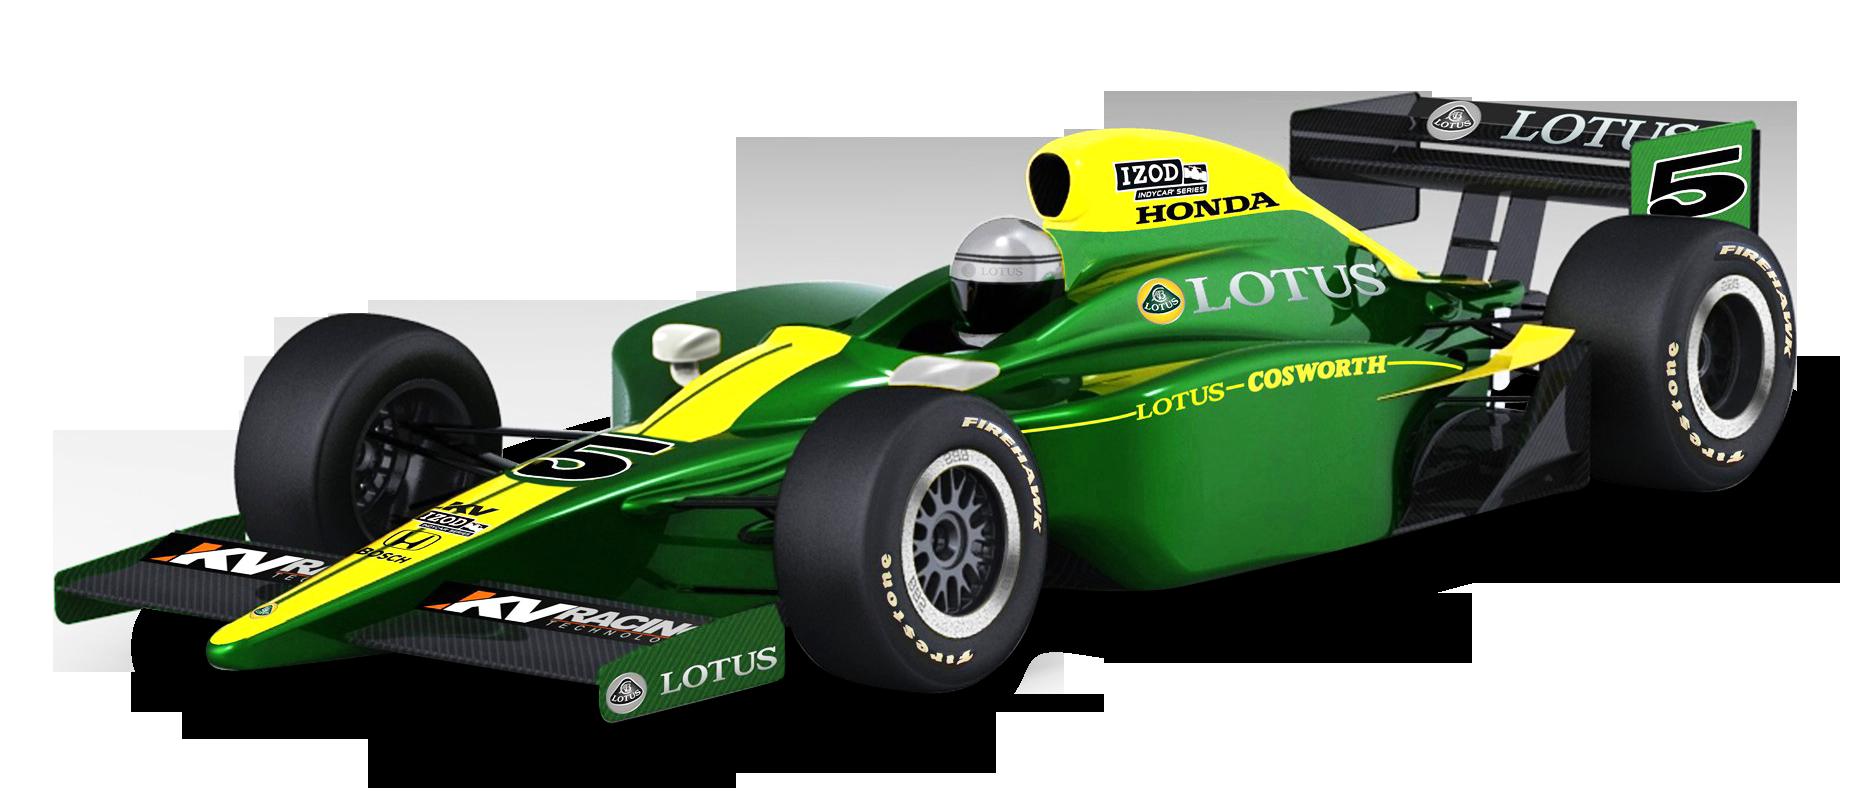 Indy car clipart image free Green Lotus Cosworth Racing Car PNG Image - PngPix image free